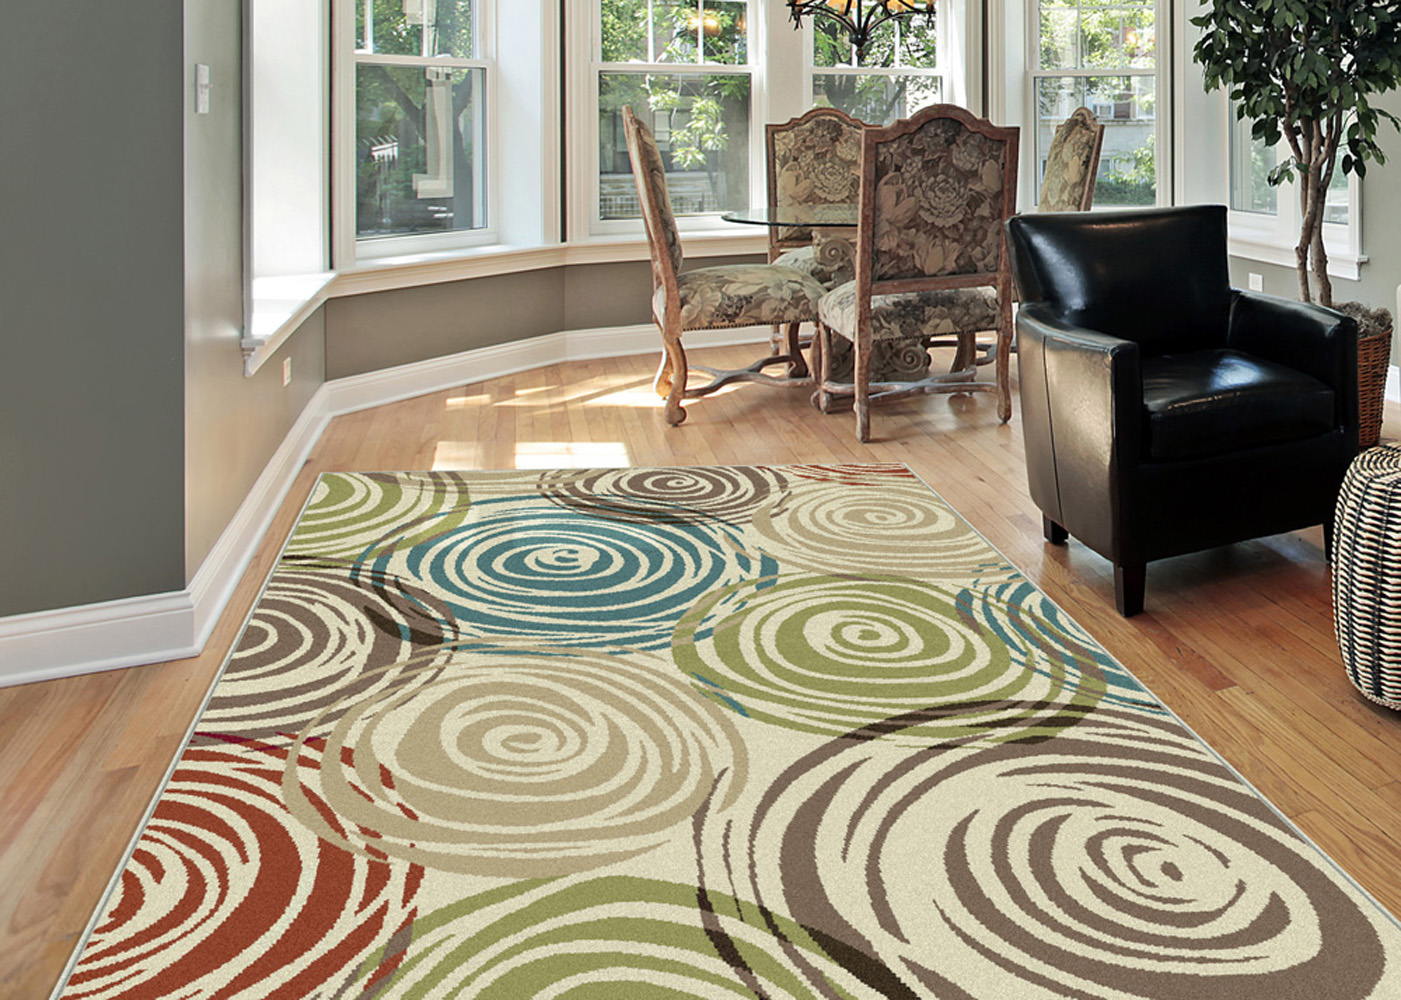 ^ Ivory ontemporary ircles rea ug Modern Geometric Swirls Multi ...